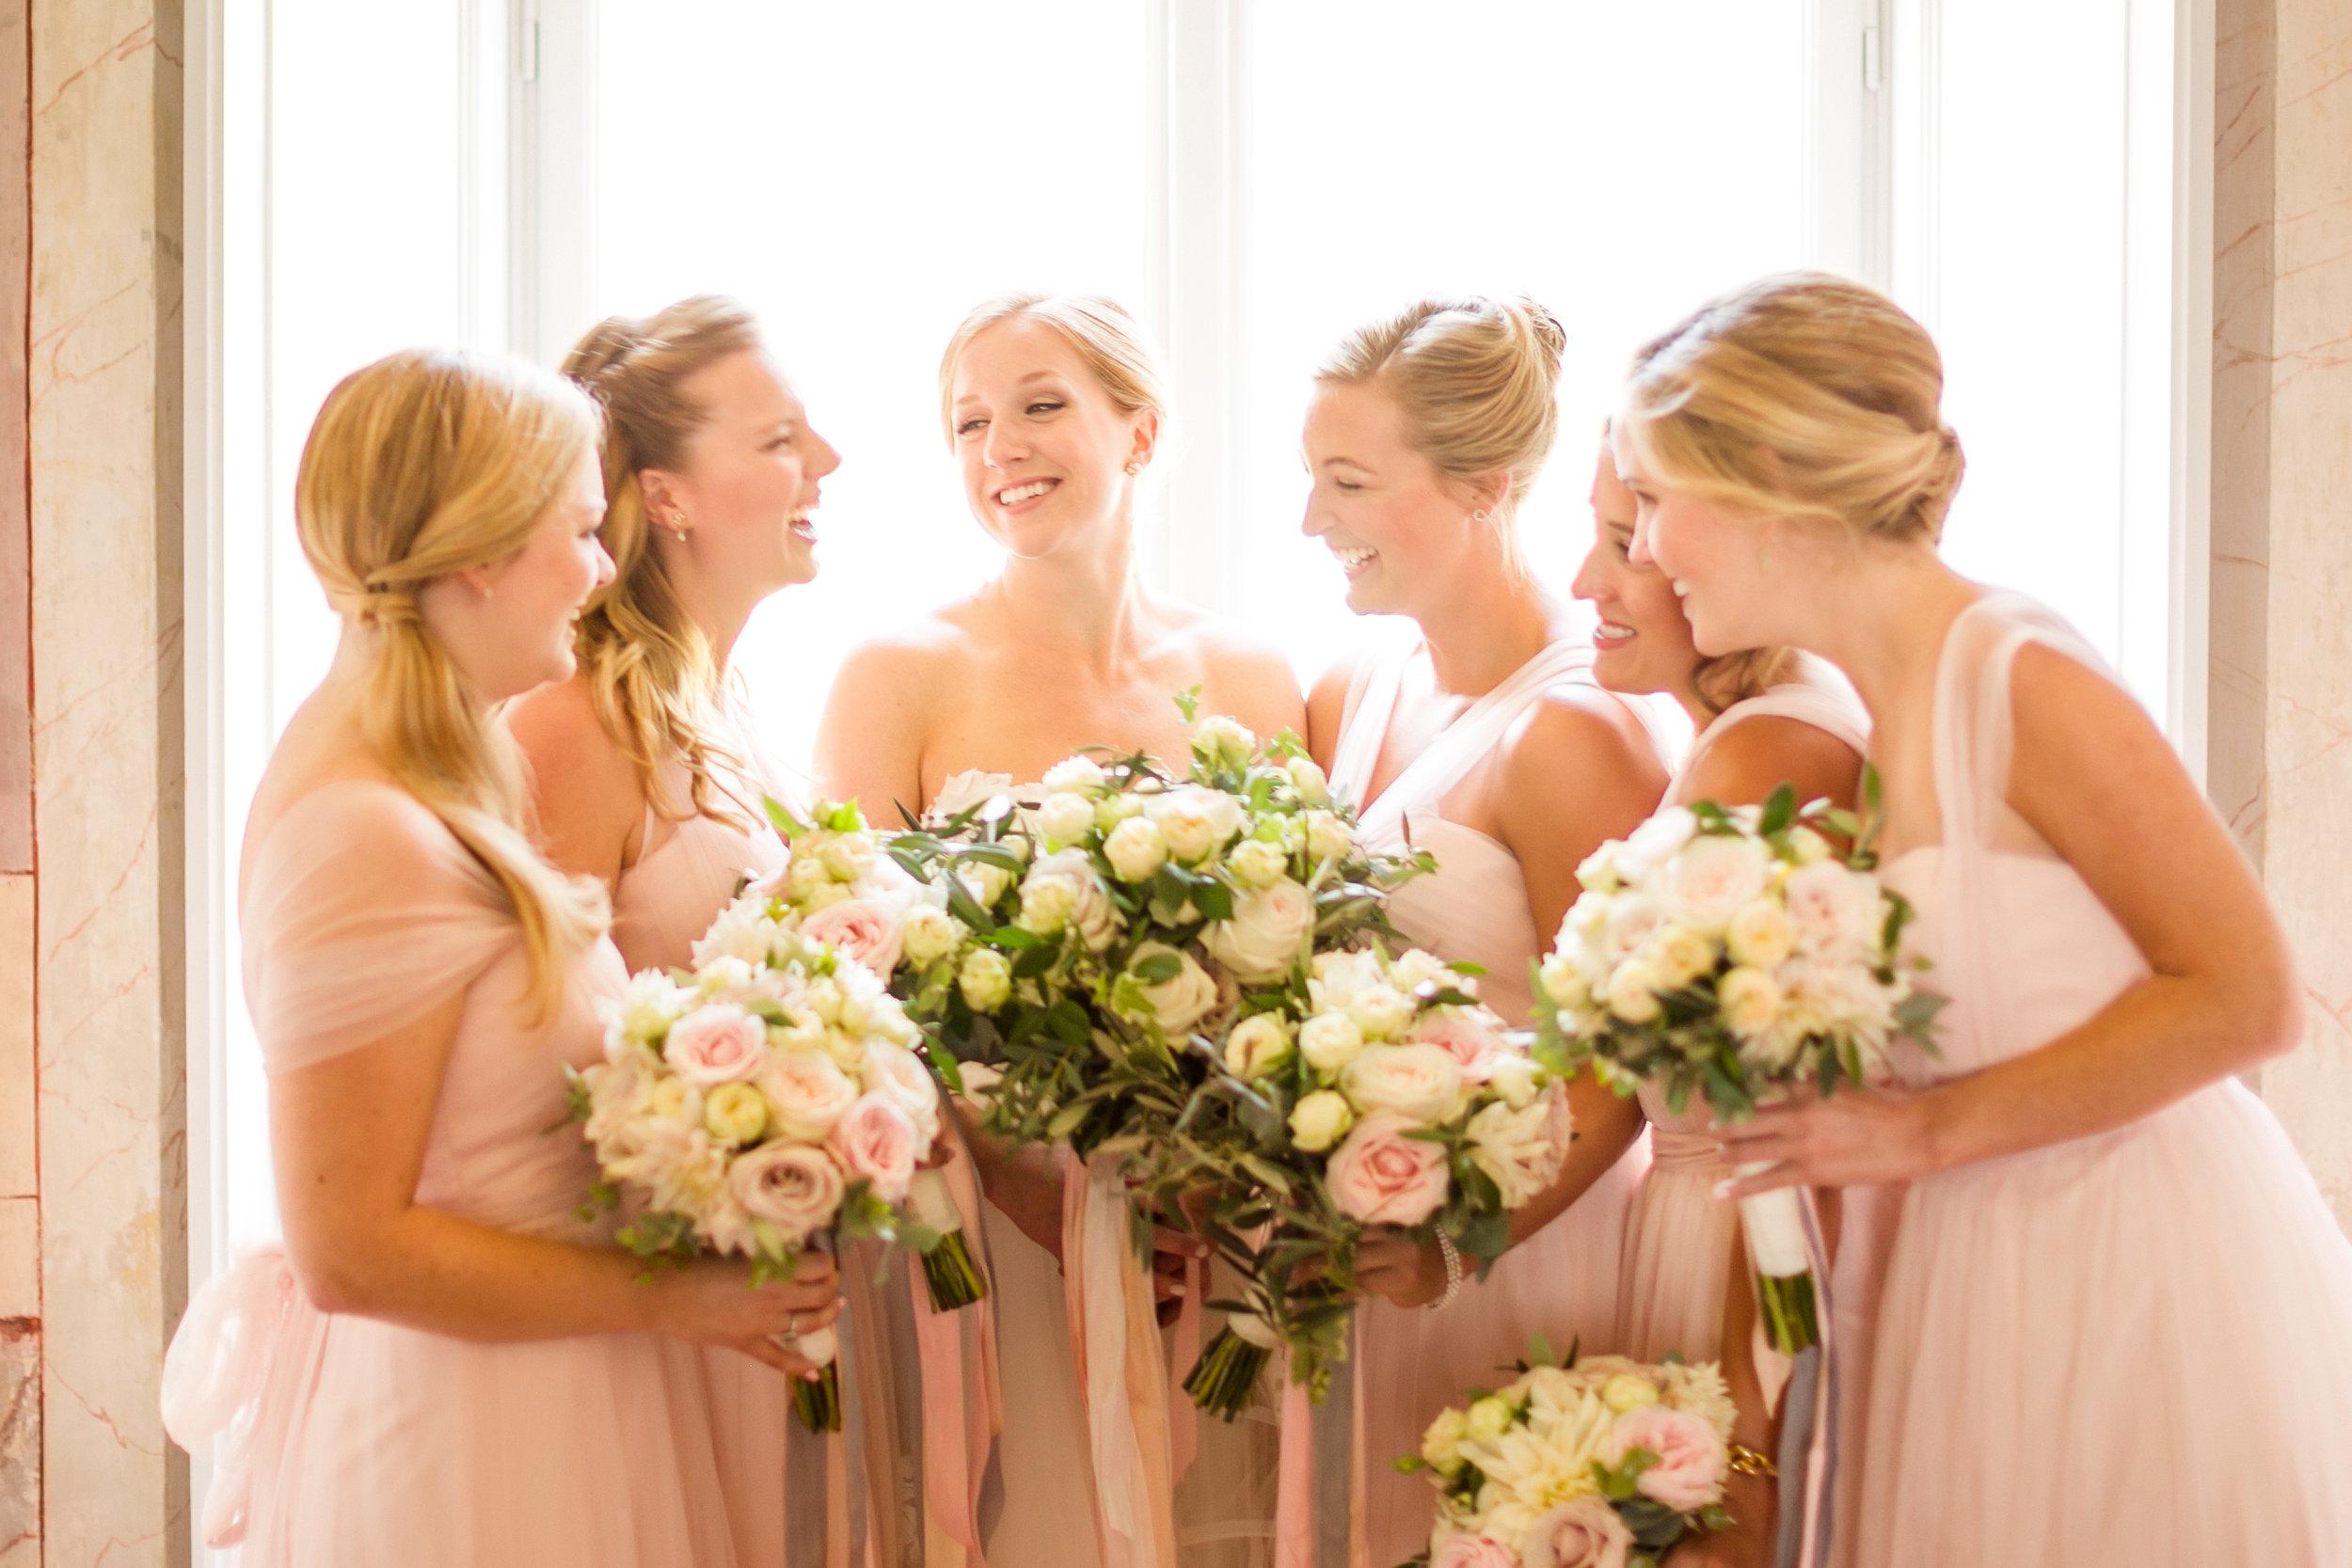 04_bridesmaids-0420.jpg